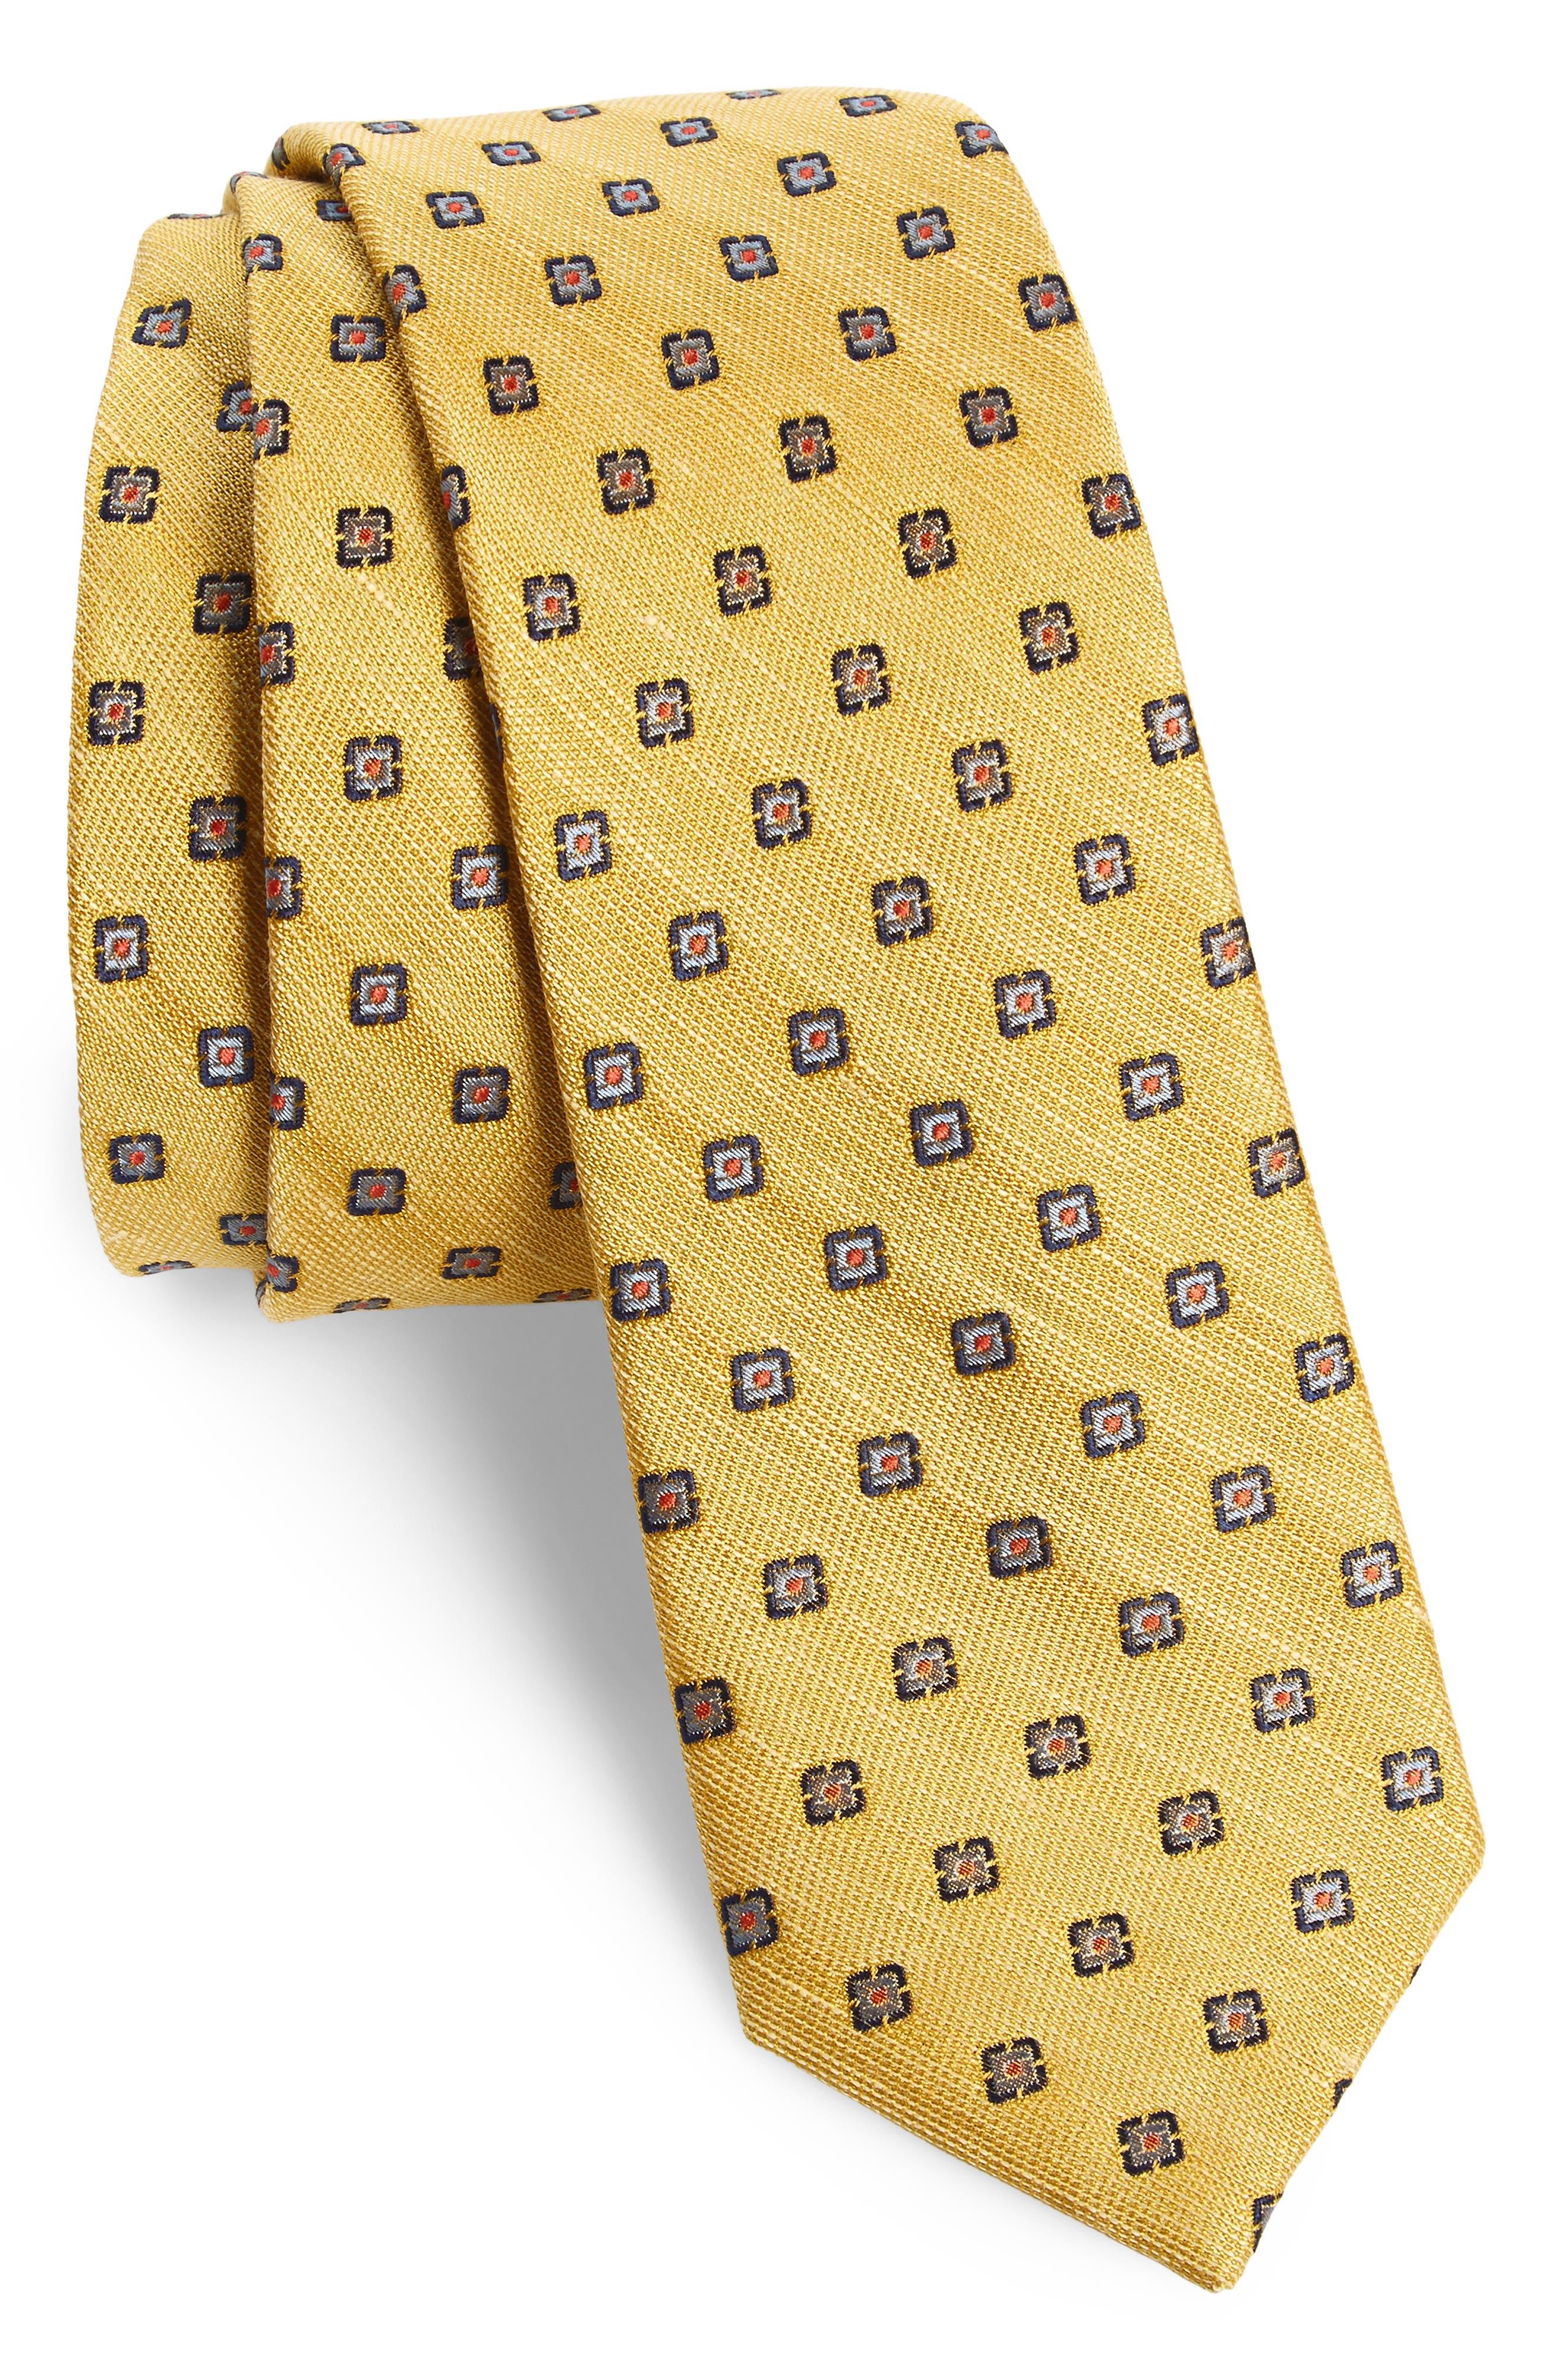 The Tie Bar Medallion Scene Silk & Linen Skinny Tie